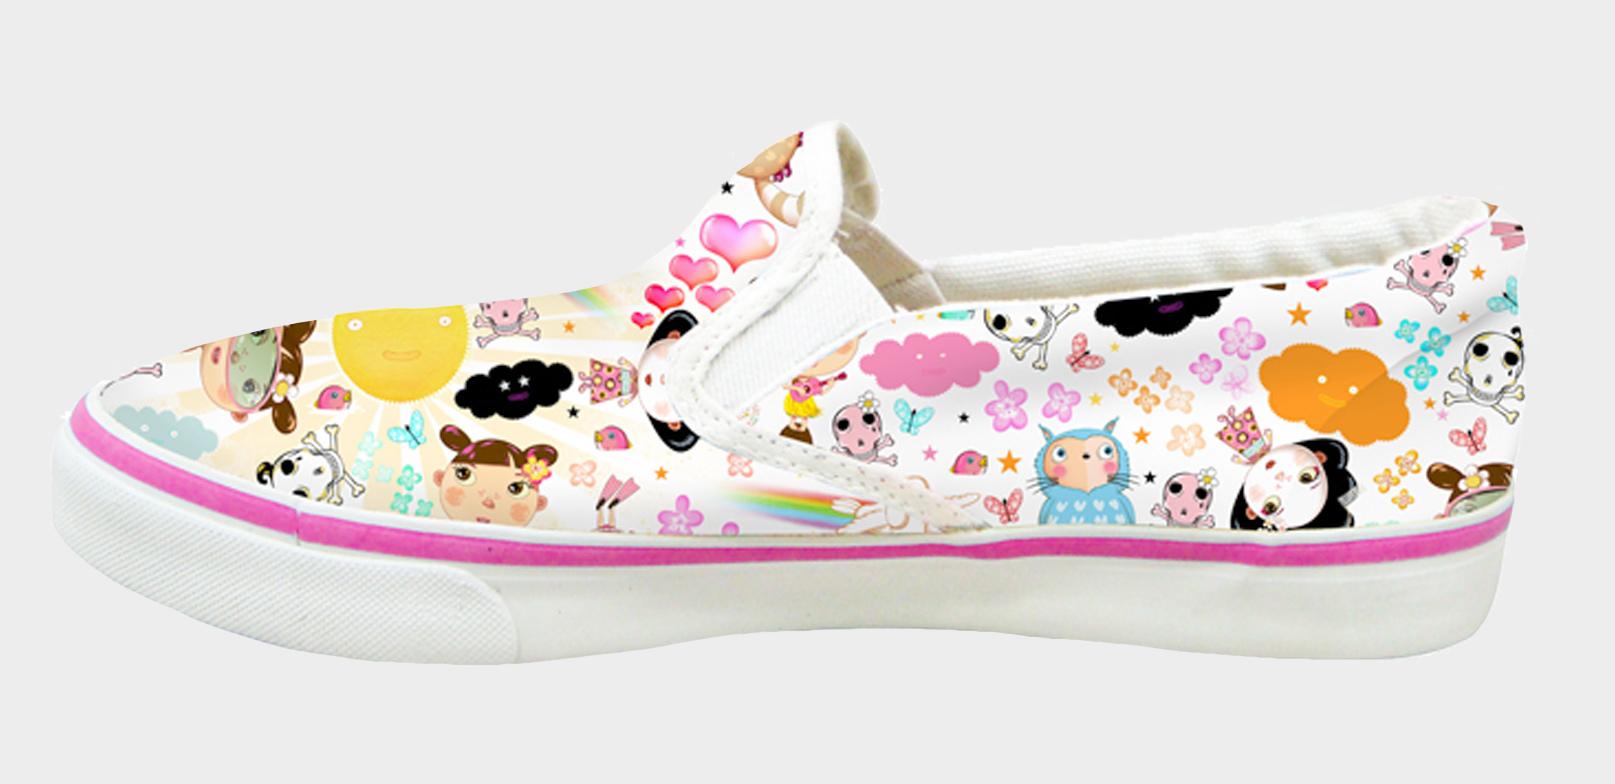 andy ward shoes.jpg